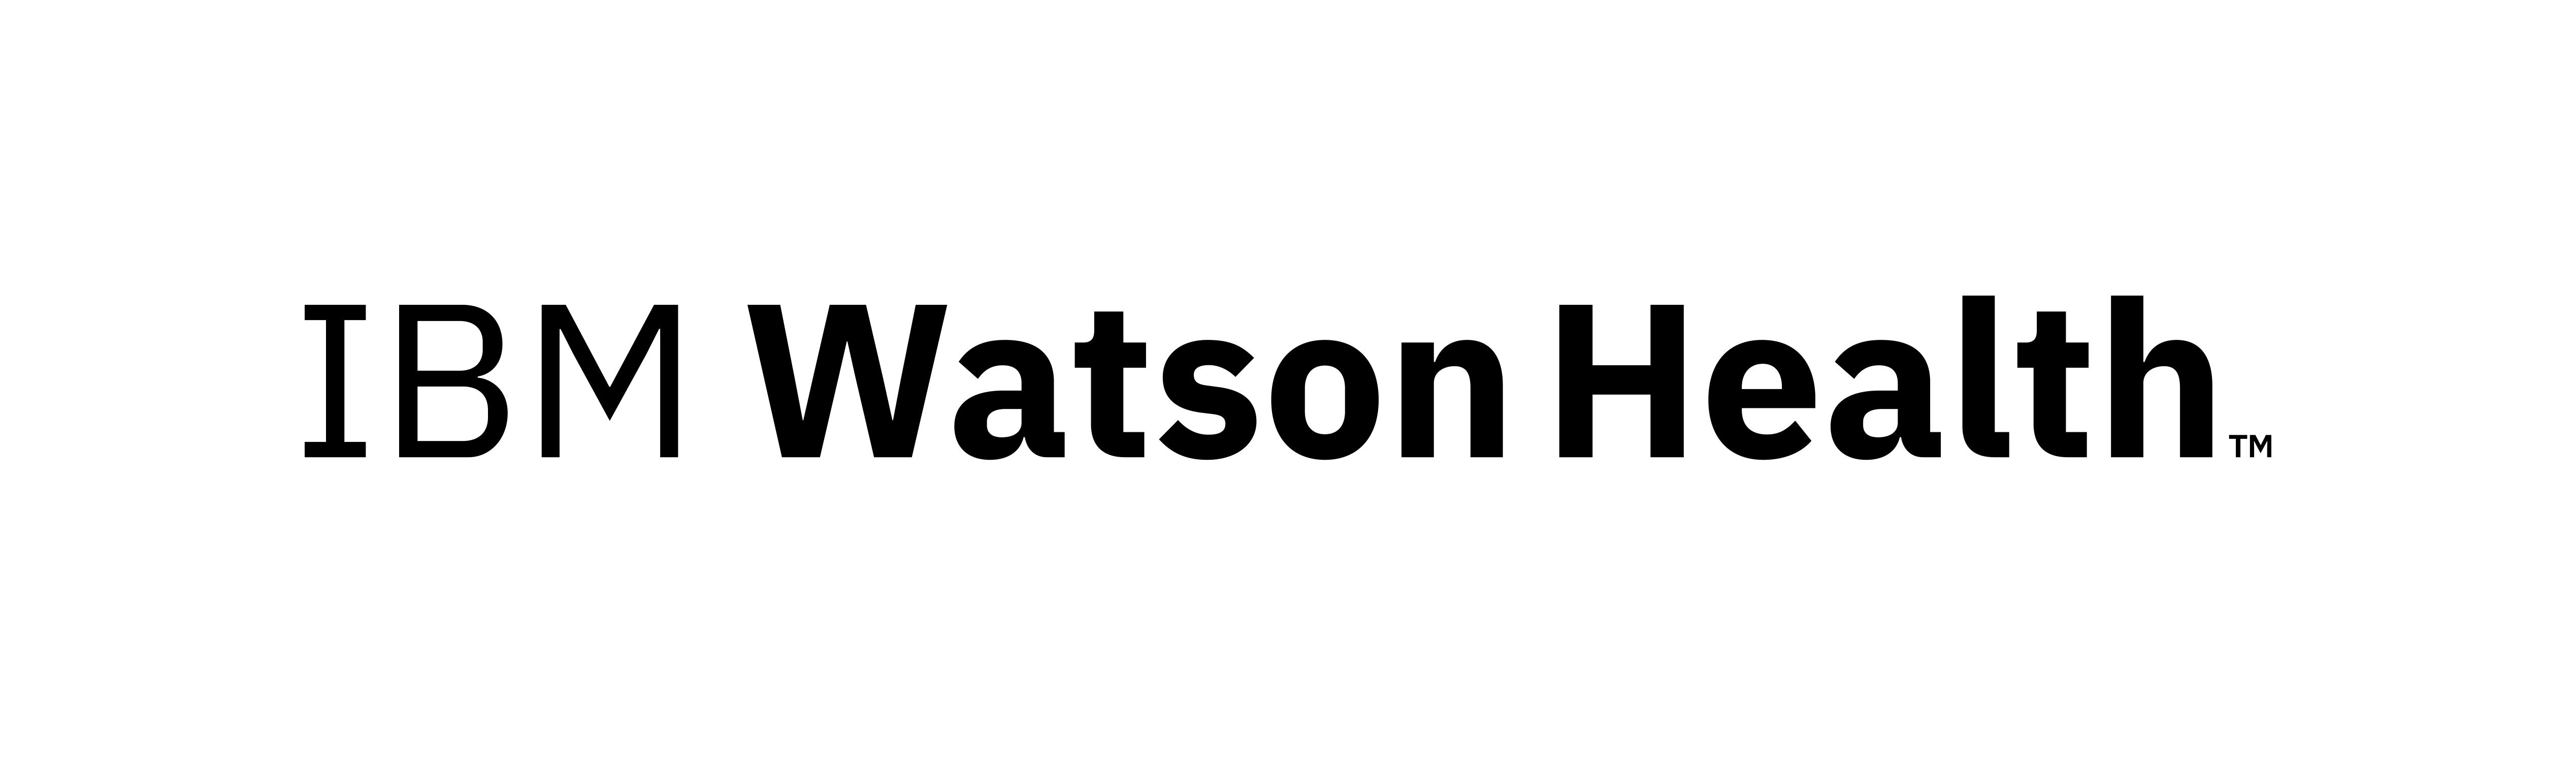 IMB HealthWatson Corporate logo